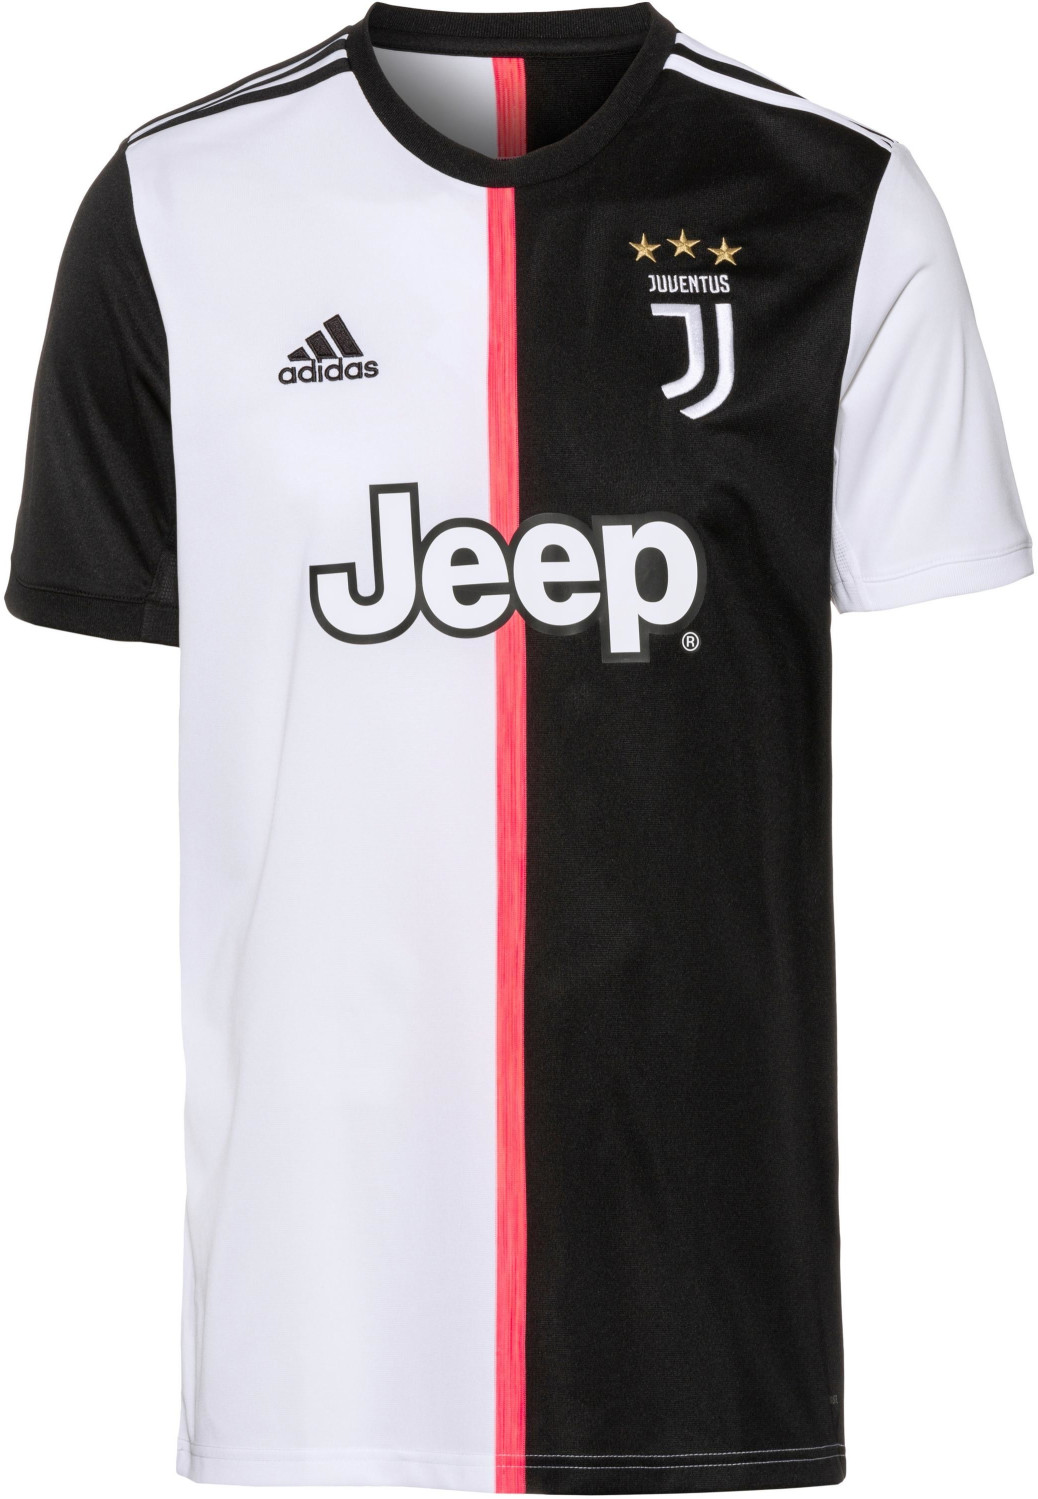 Shop den adidas Juventus FC 201920 Away Shirt Herren in